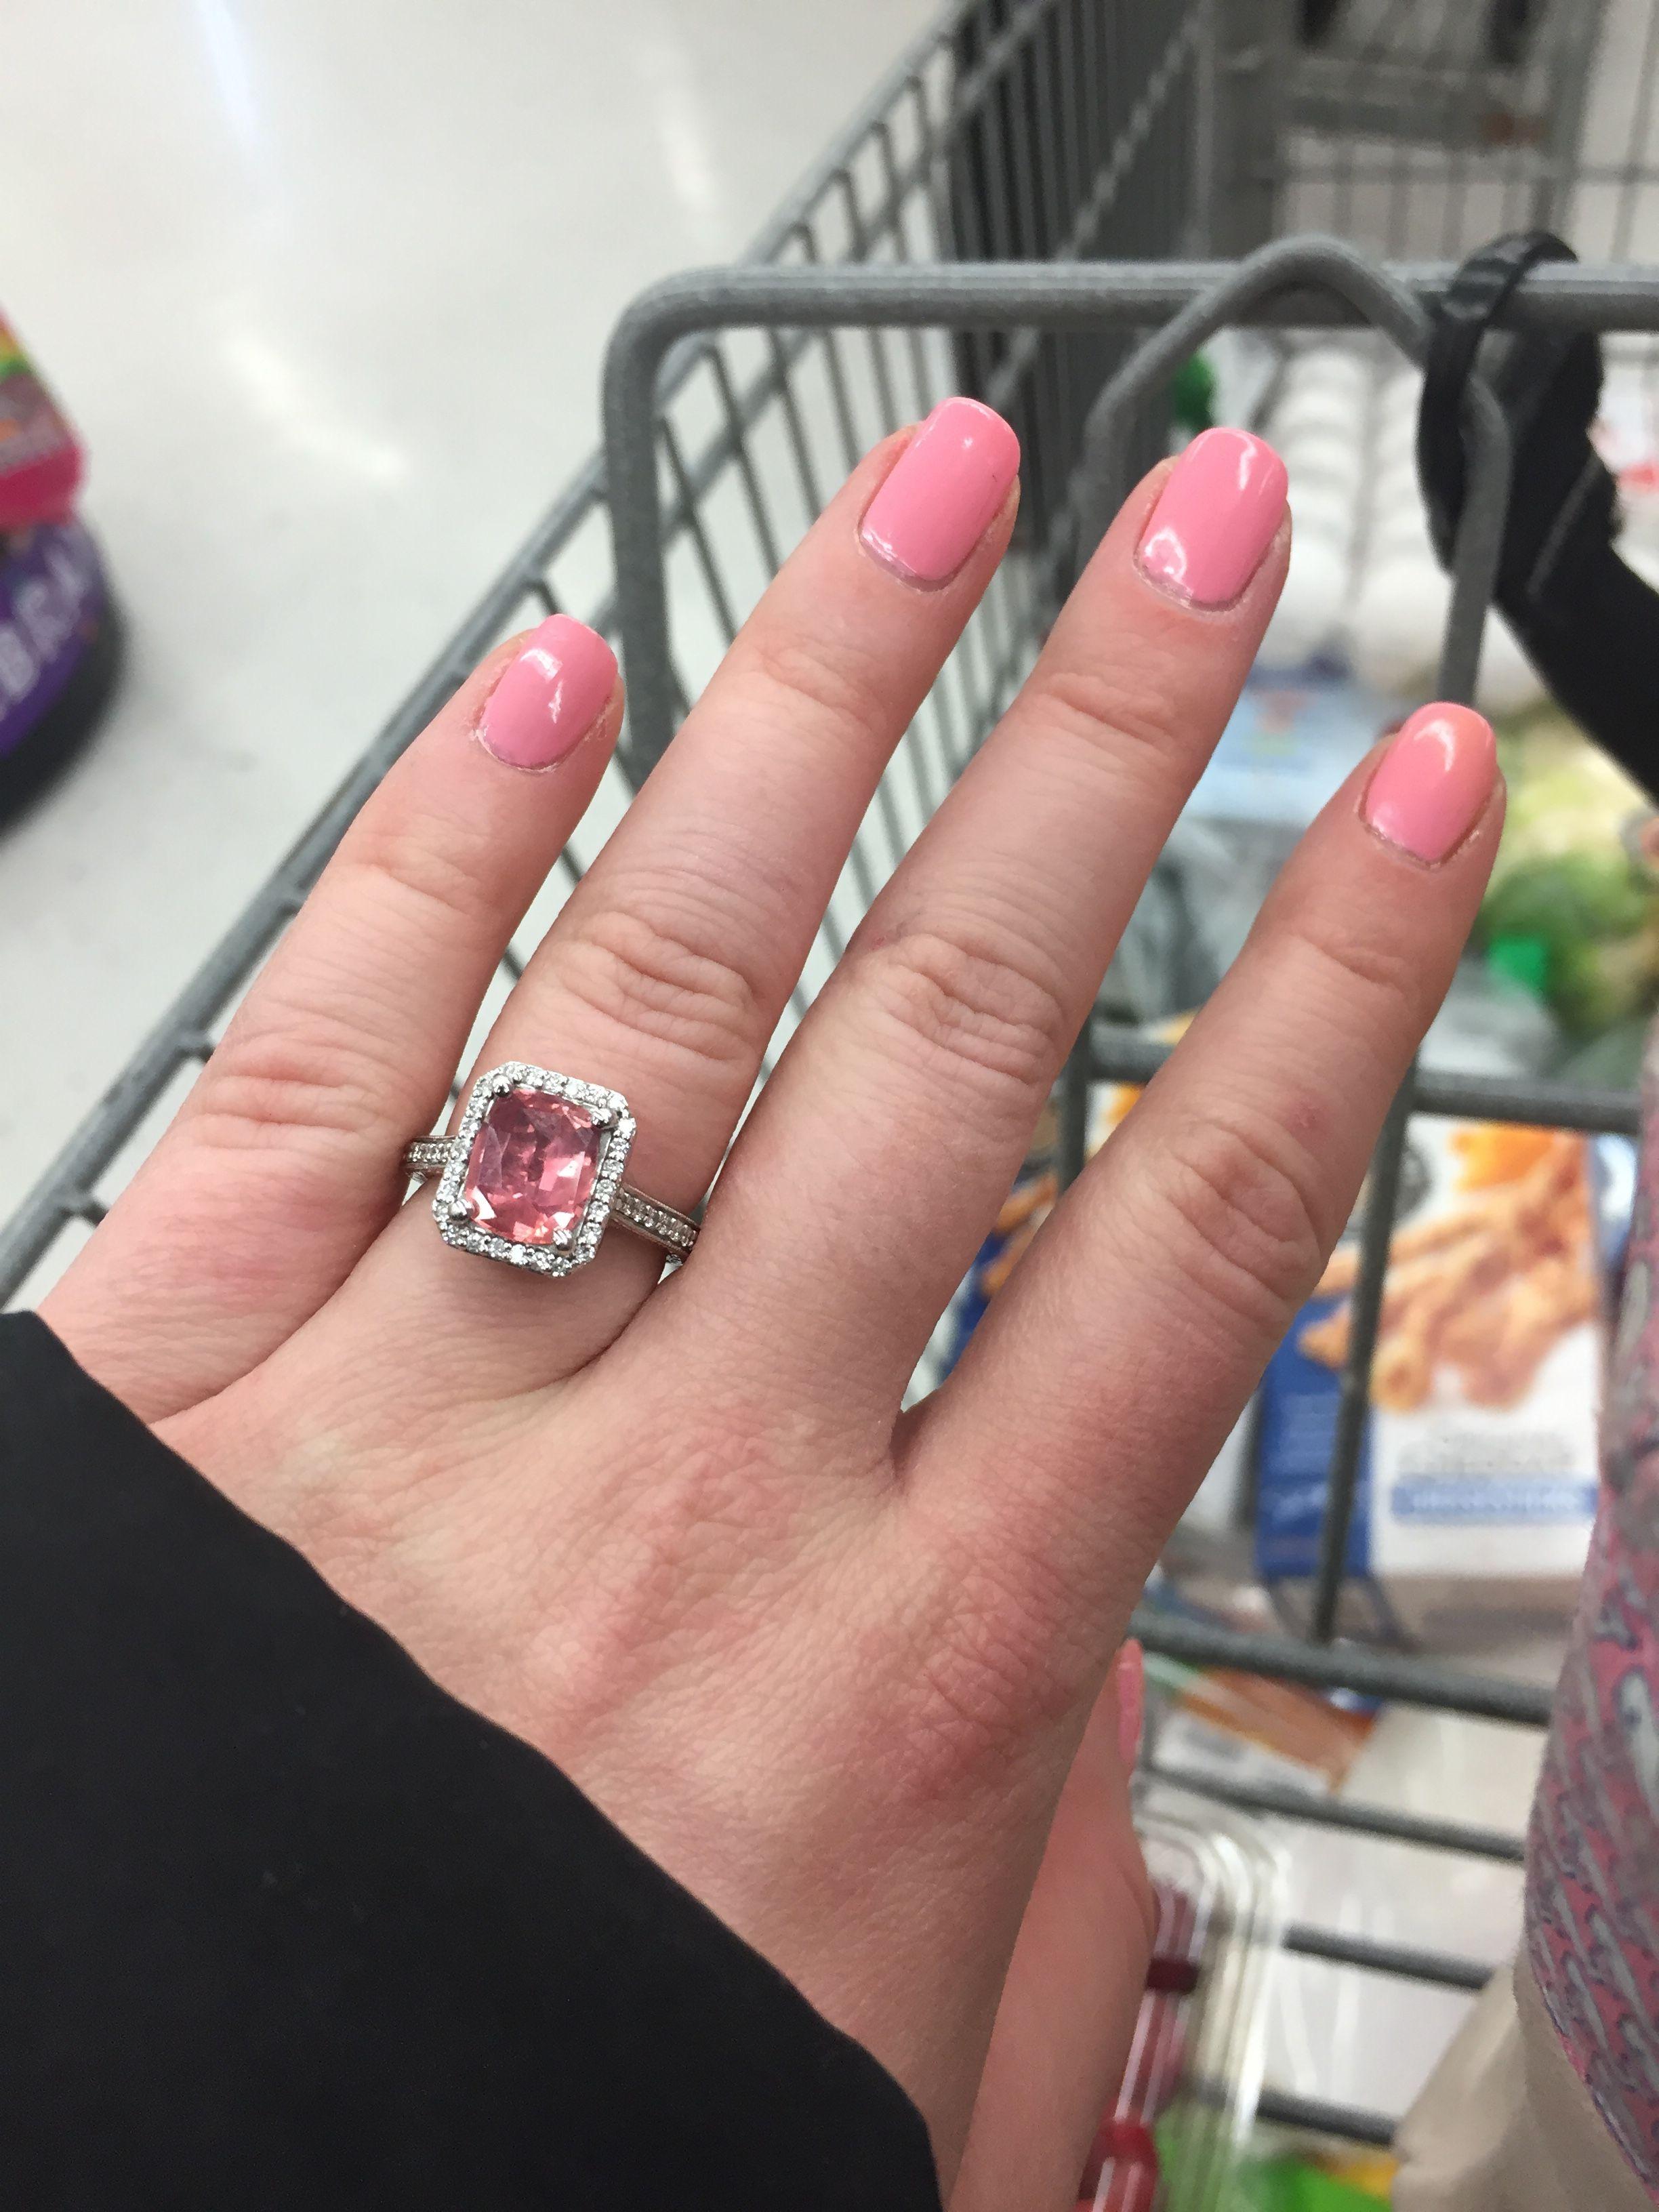 Padparadscha sapphire engagement ring carats cushion cut